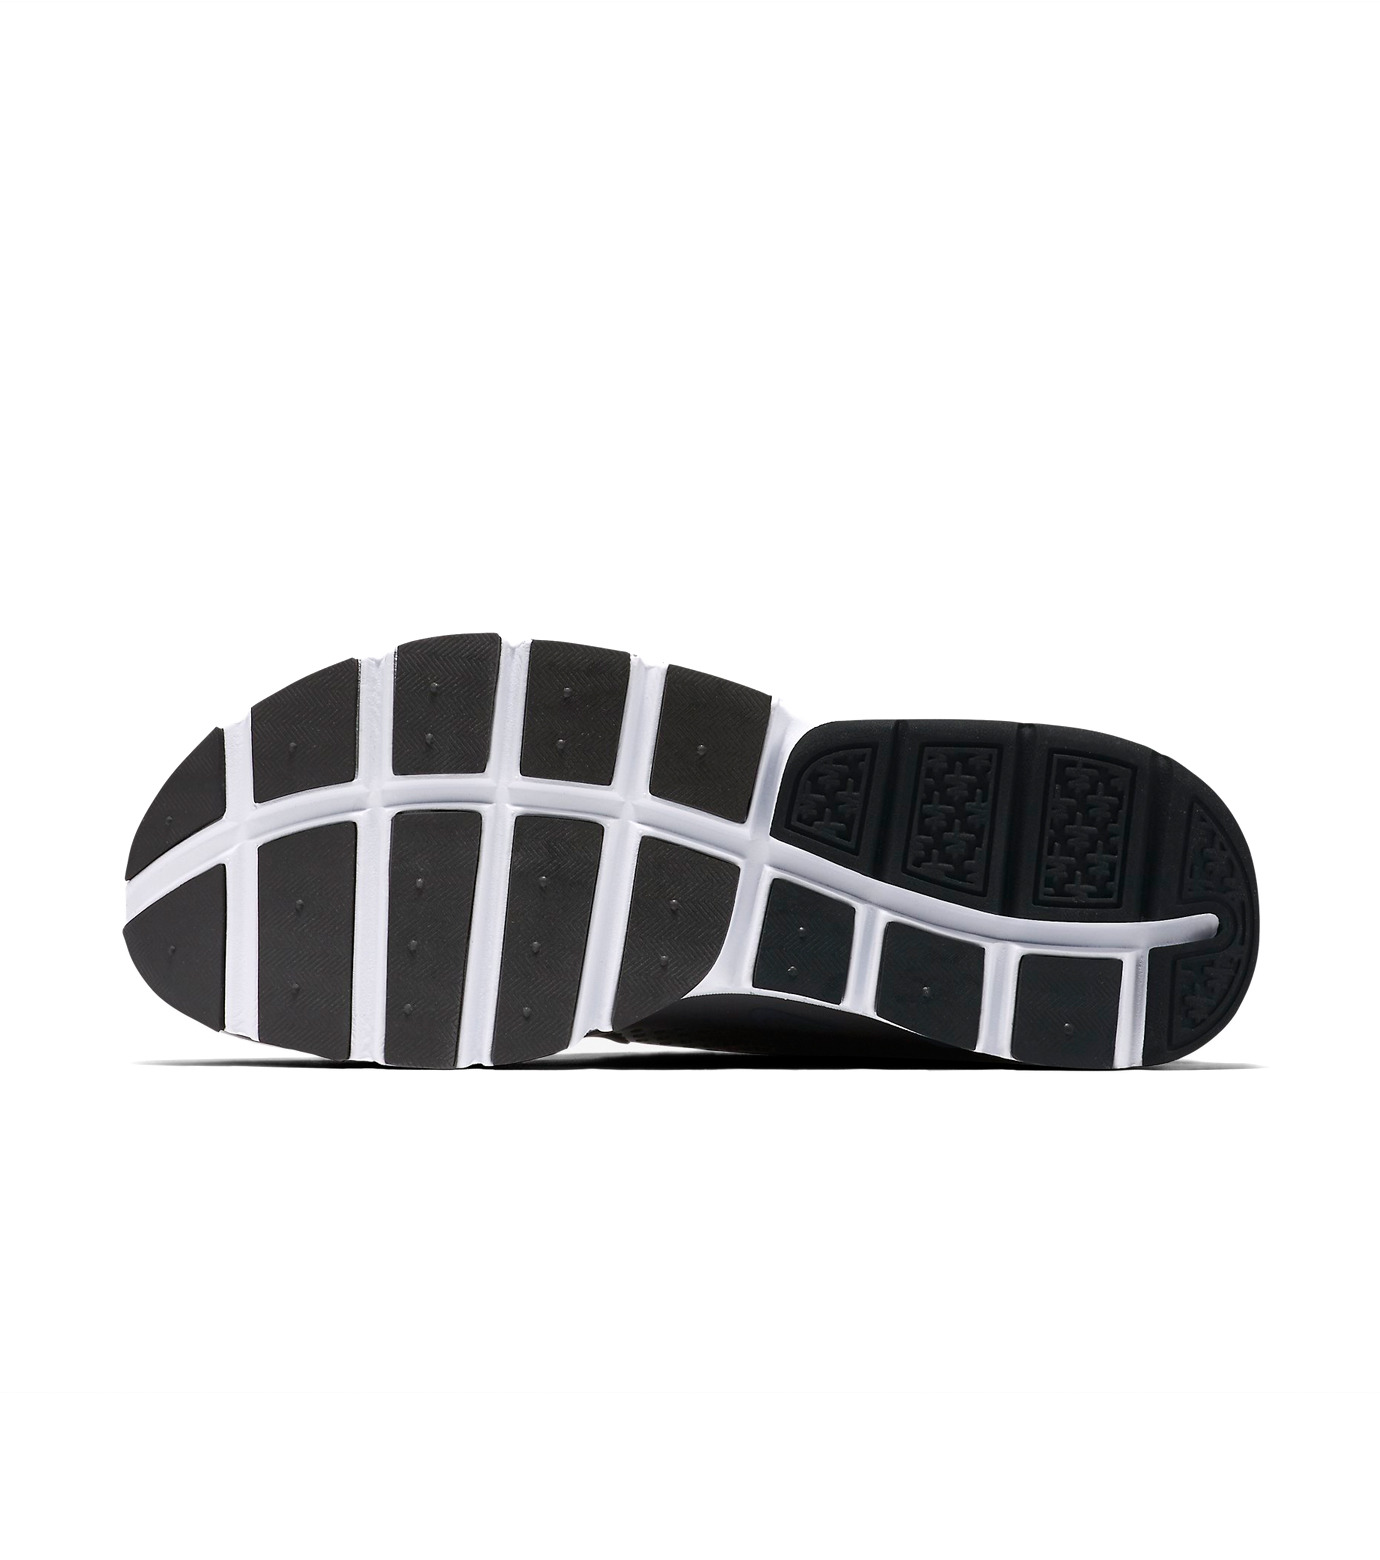 NIKE(ナイキ)のSOCK DART-GRAY(シューズ/shoes)-819686-003-11 拡大詳細画像2